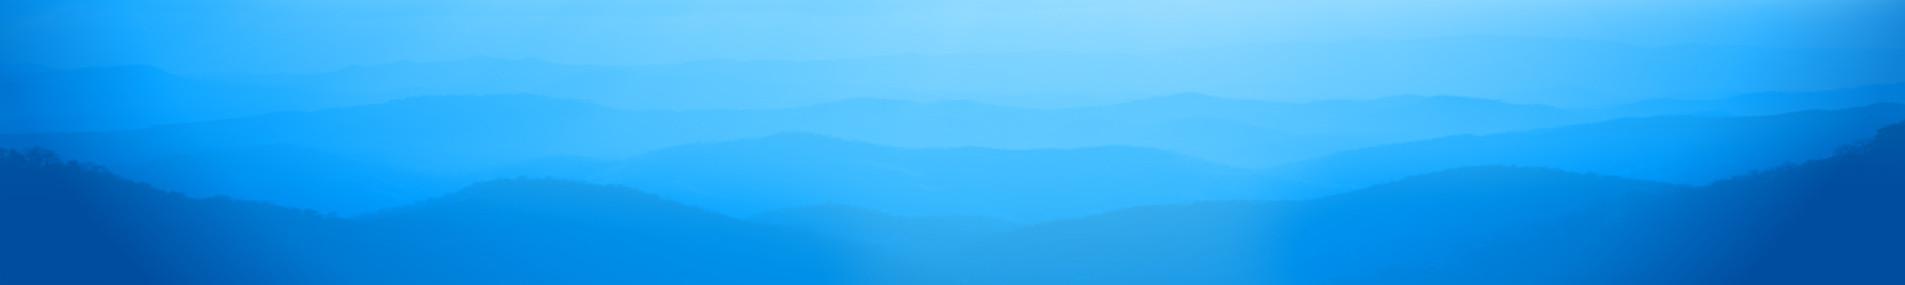 MOUNTAINS JPEG.jpg